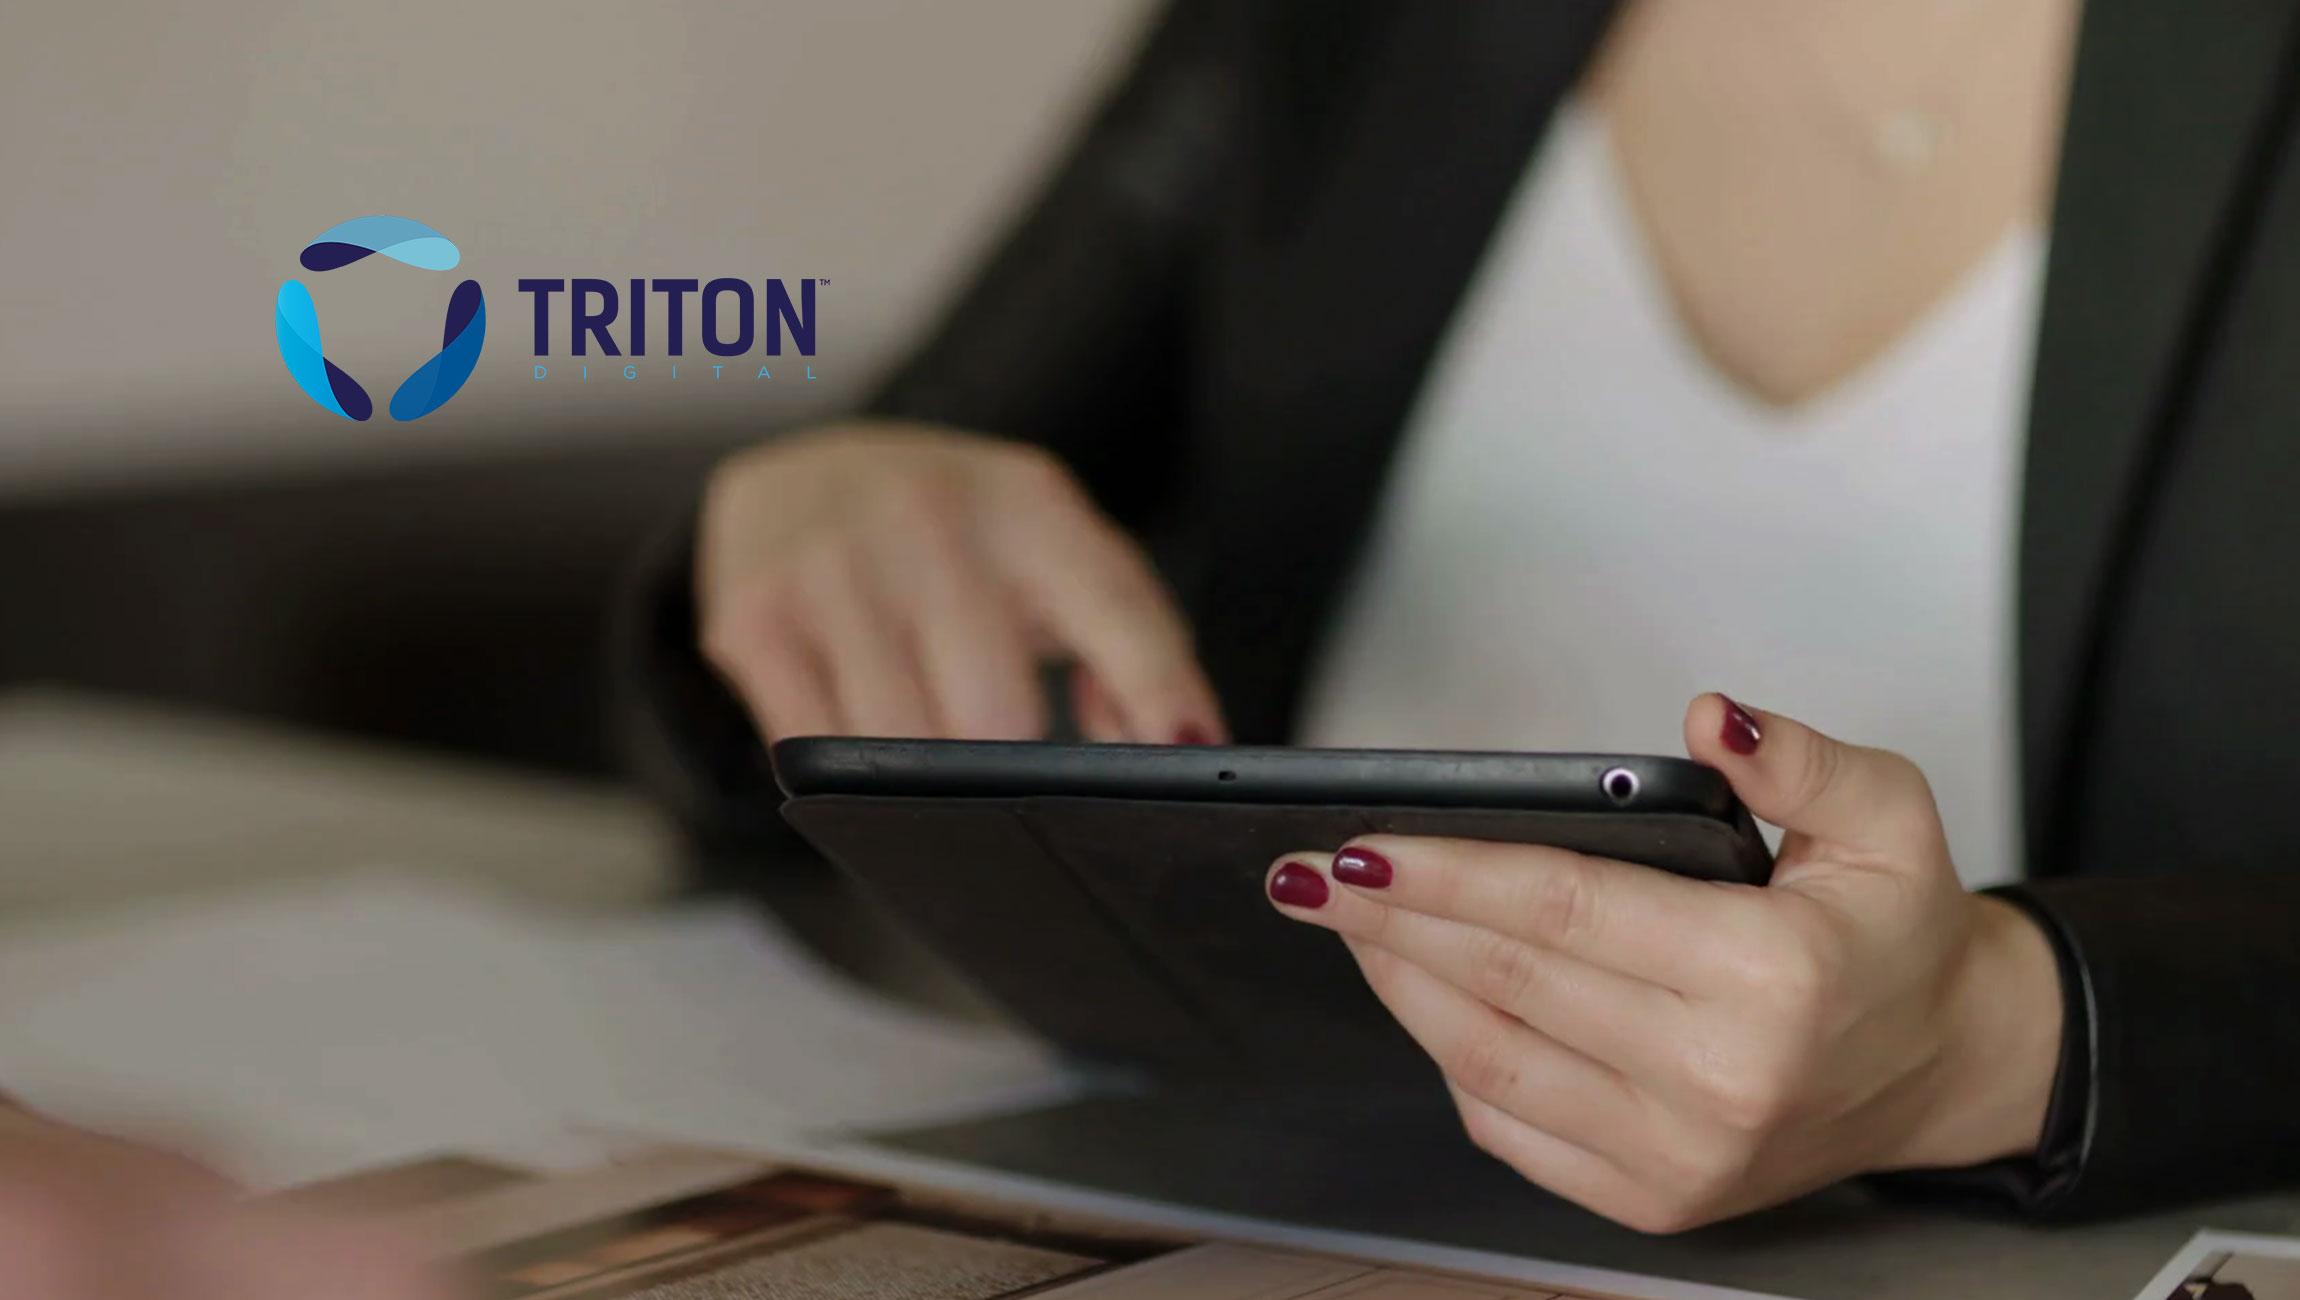 Triton Digital Releases Webcast Metrics Rankings for the Top Digital Audio Properties for October 2019